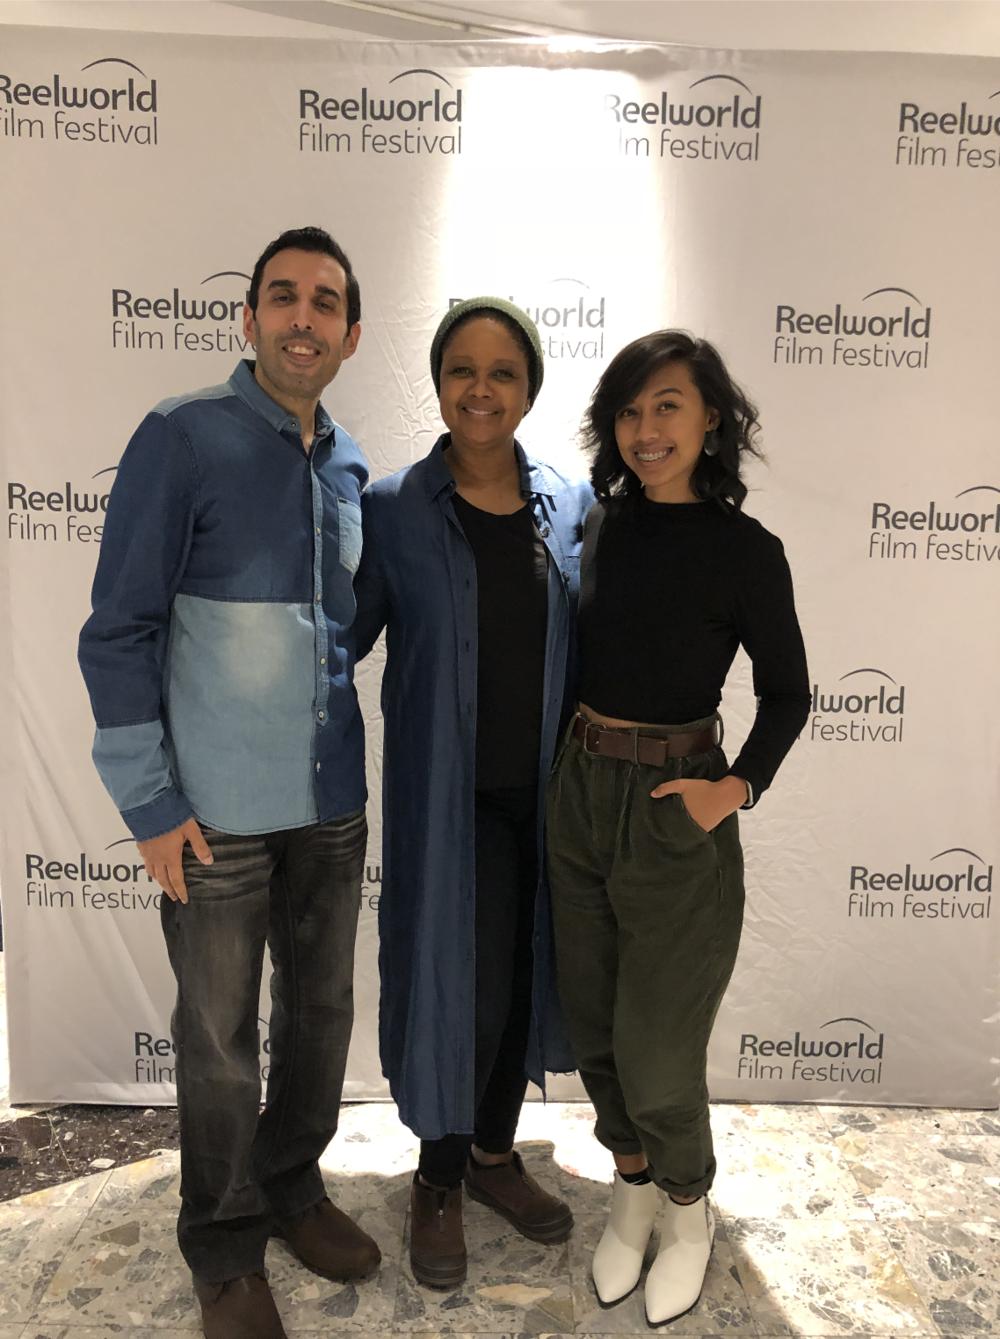 Canada Premier @ Toronto, Canada Toronto ReelWorld Film Festival